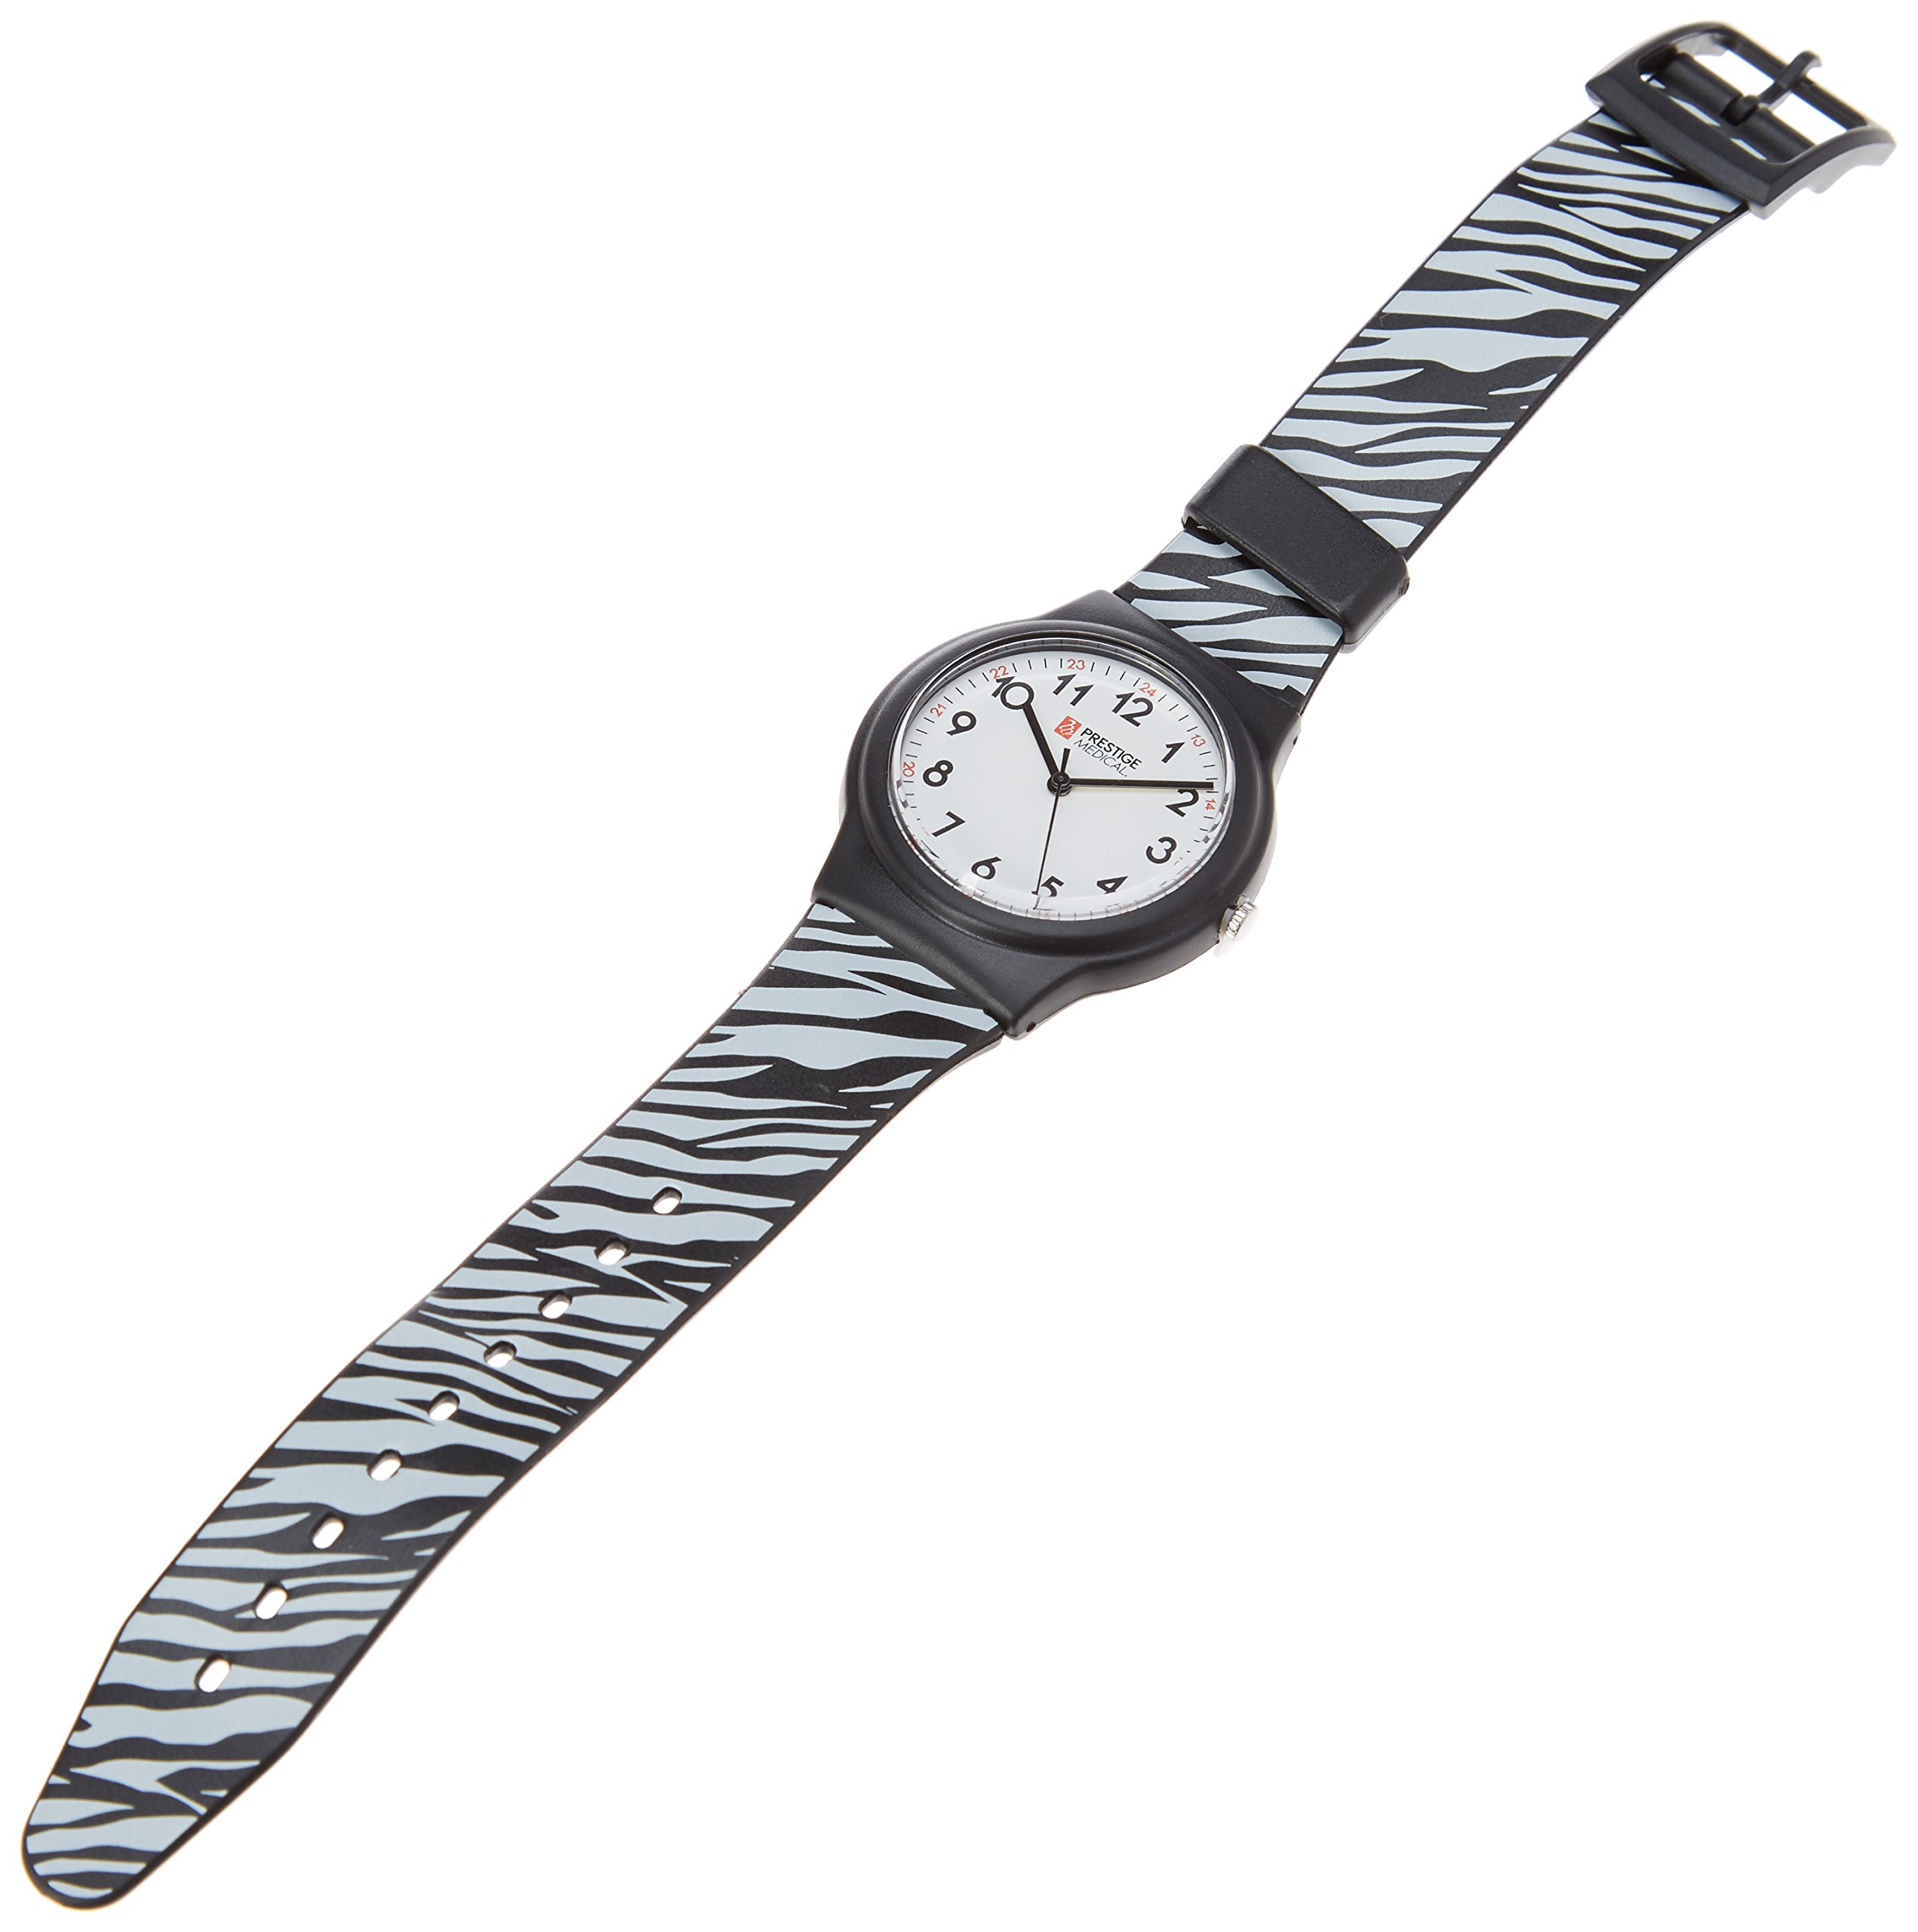 Prestige Medical Basic Scrub Watch, Zebra